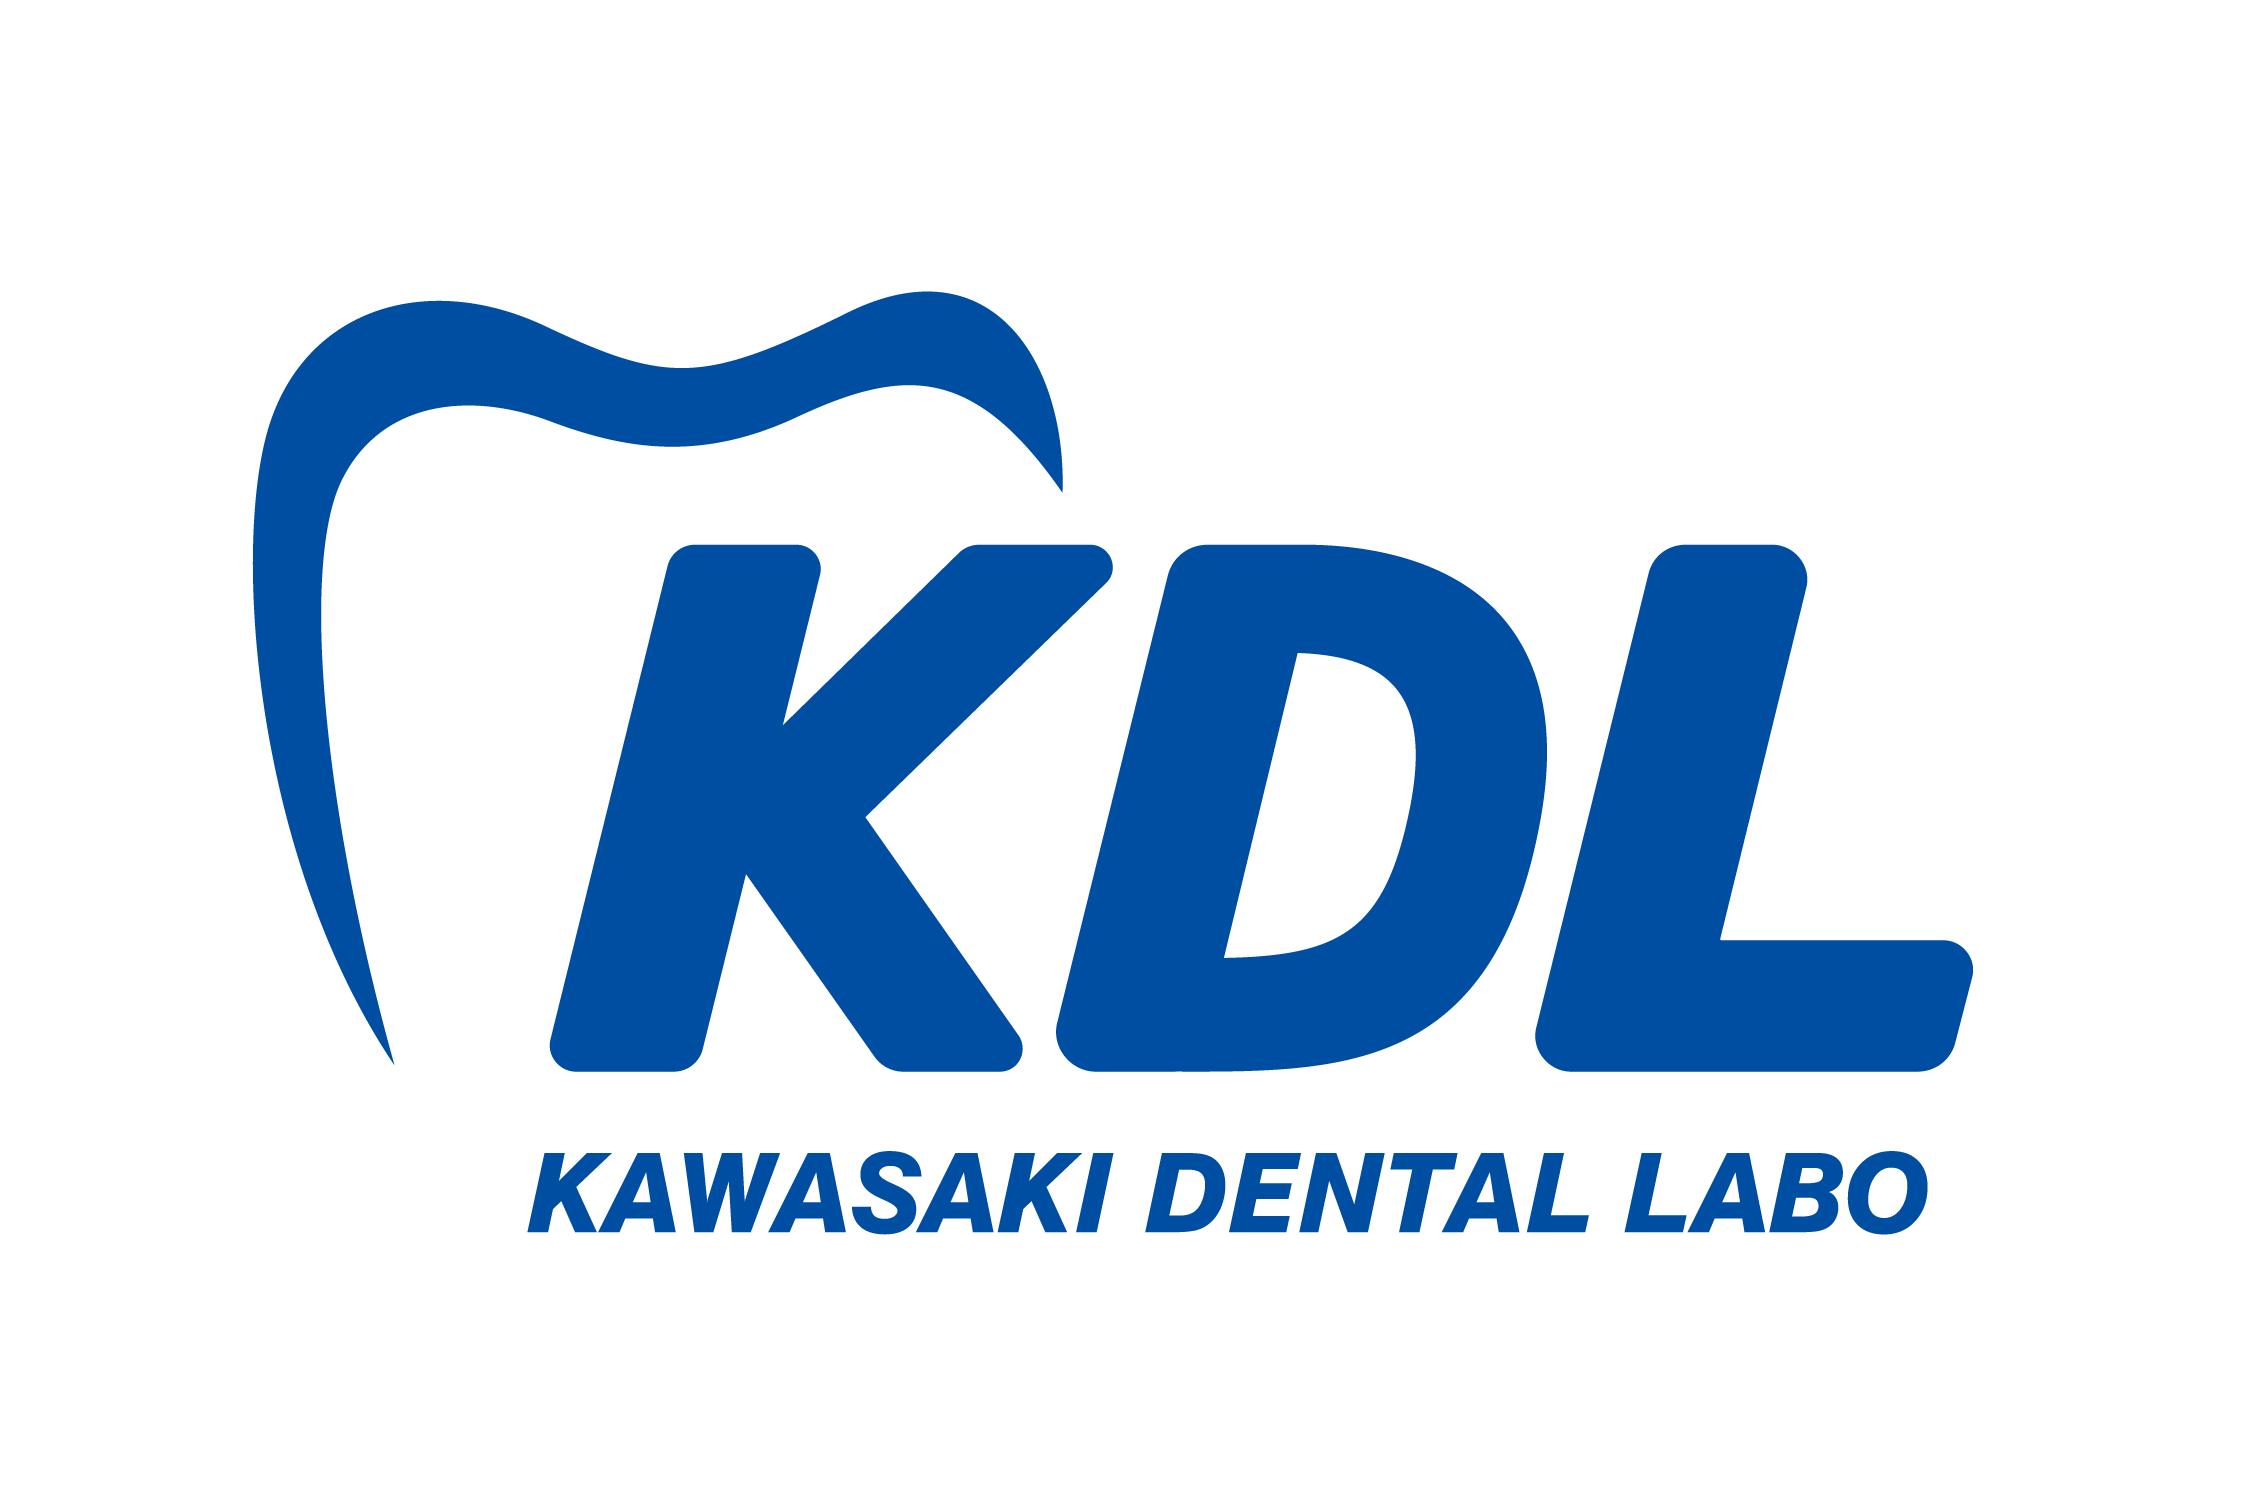 vi_kawasaki-dental-labo_3